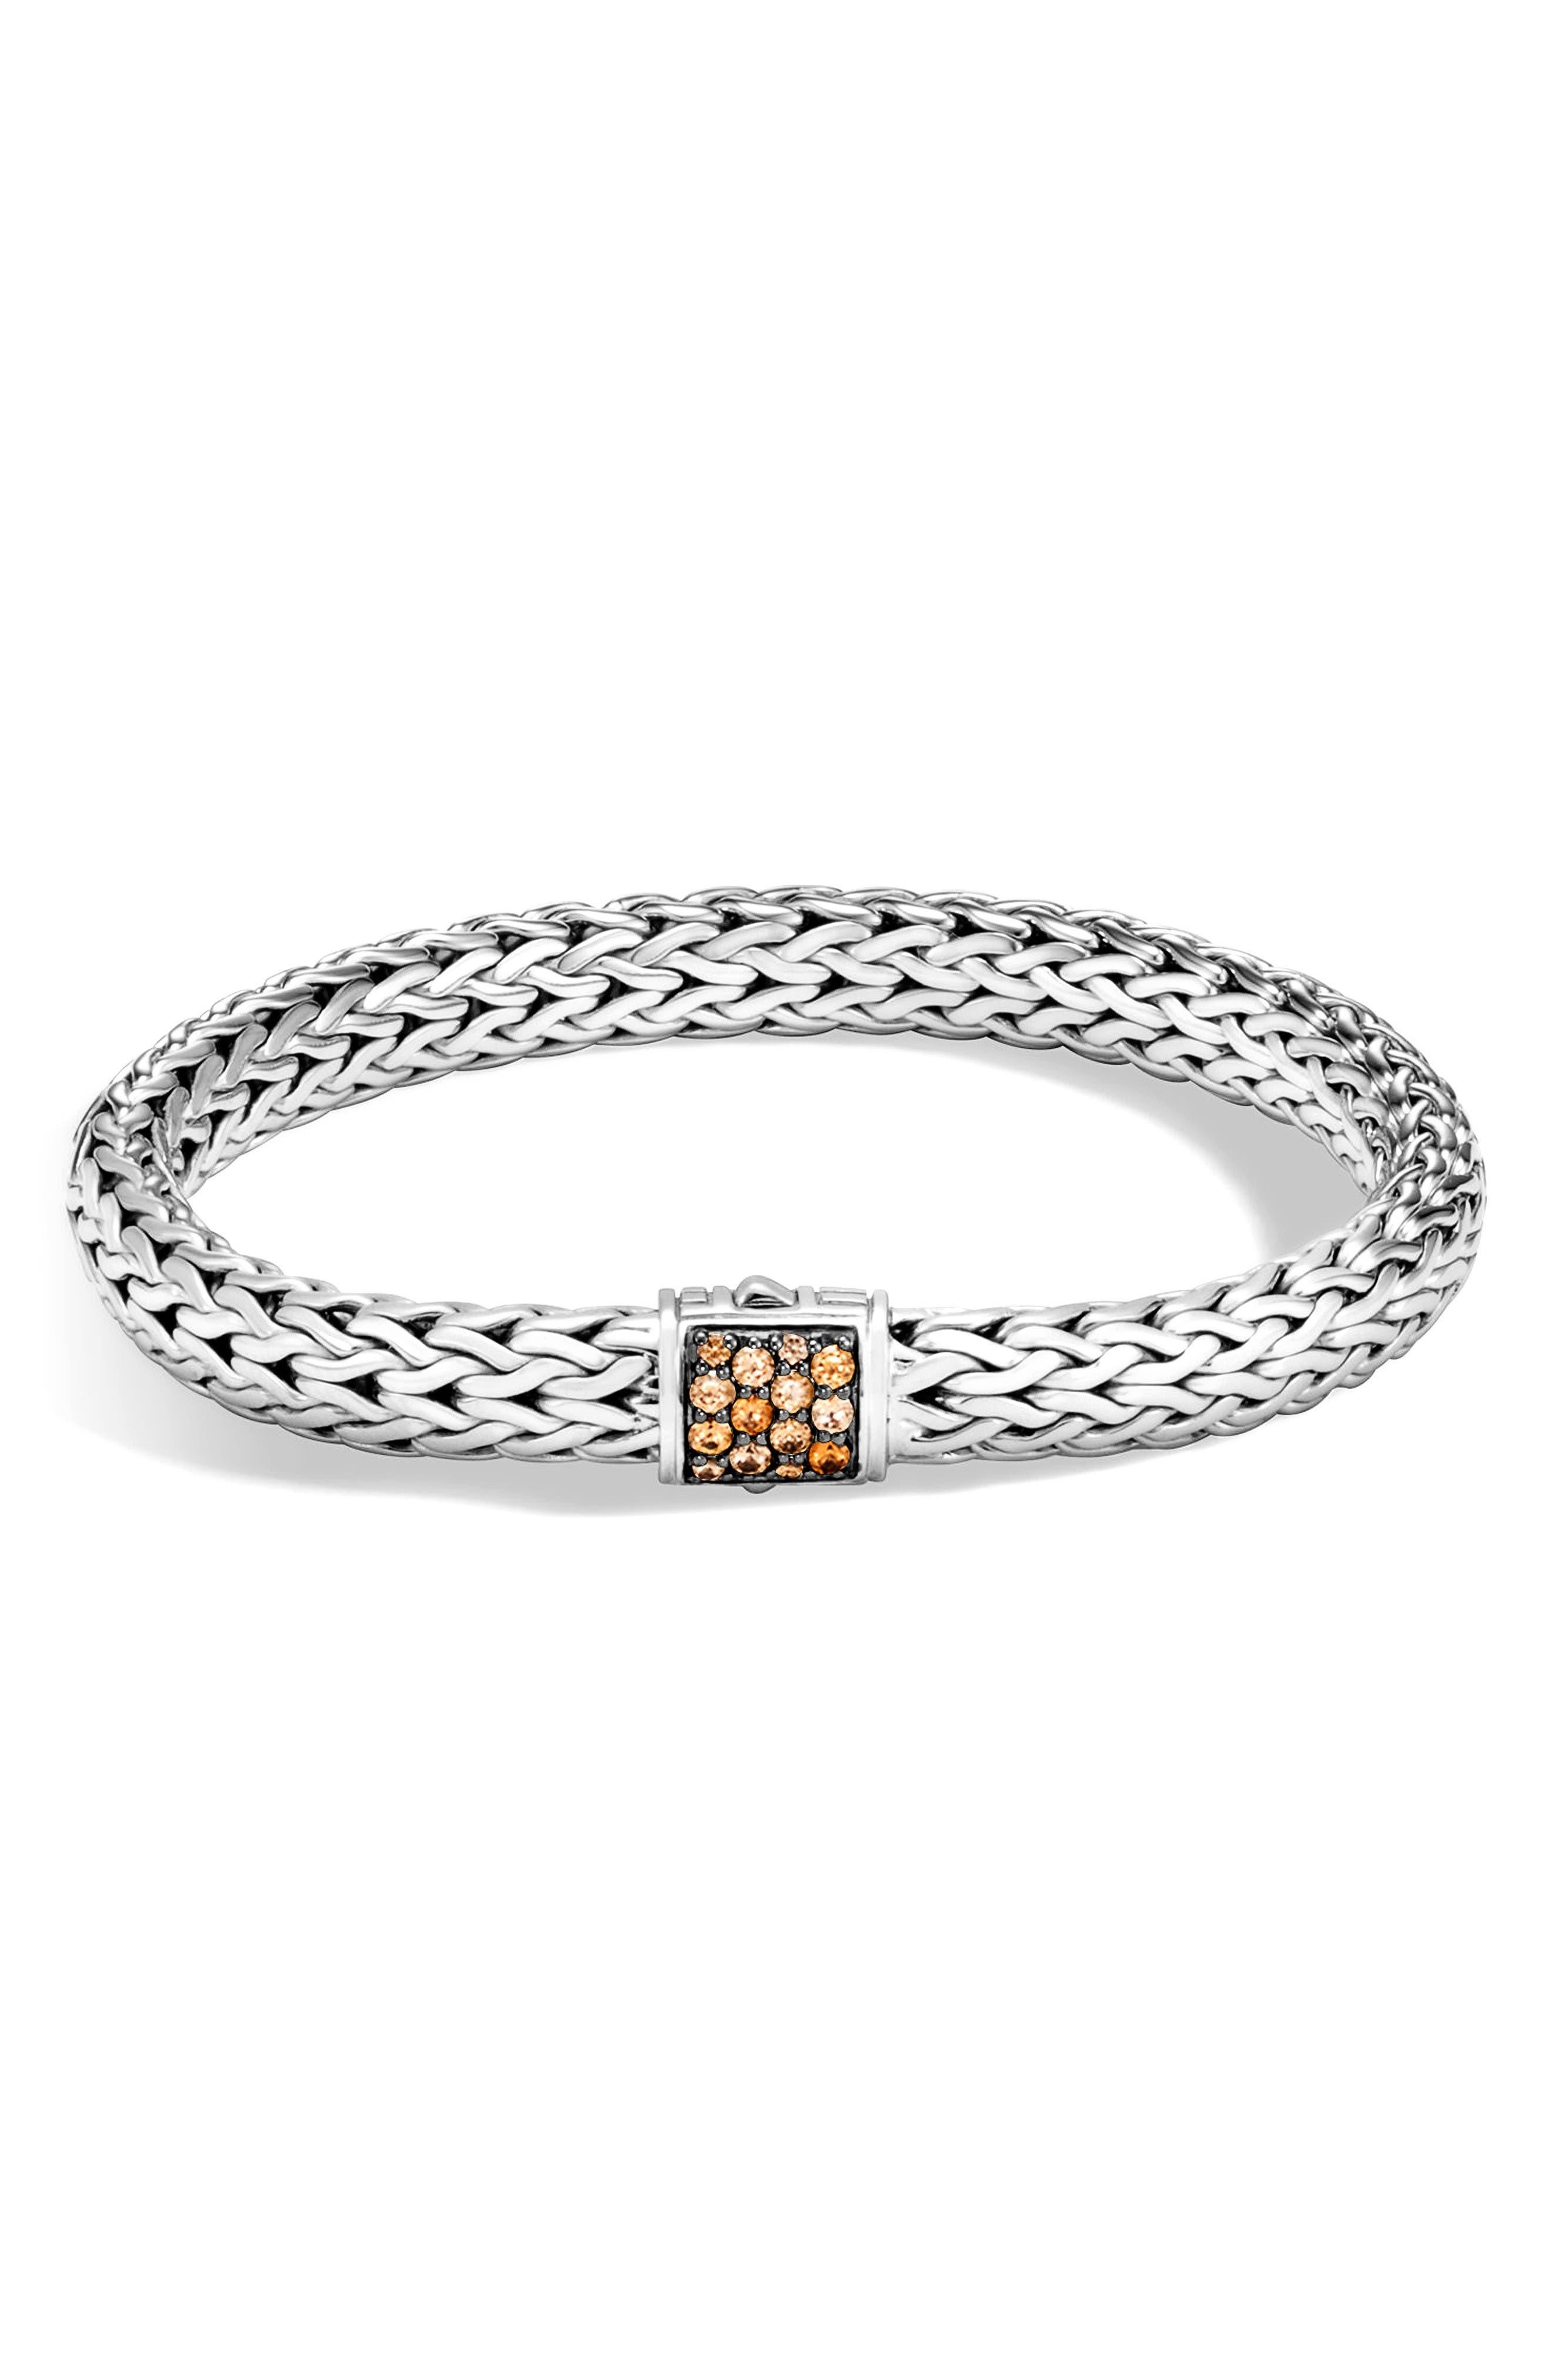 Main Image - John Hardy Classic Chain 7.5mm Bracelet